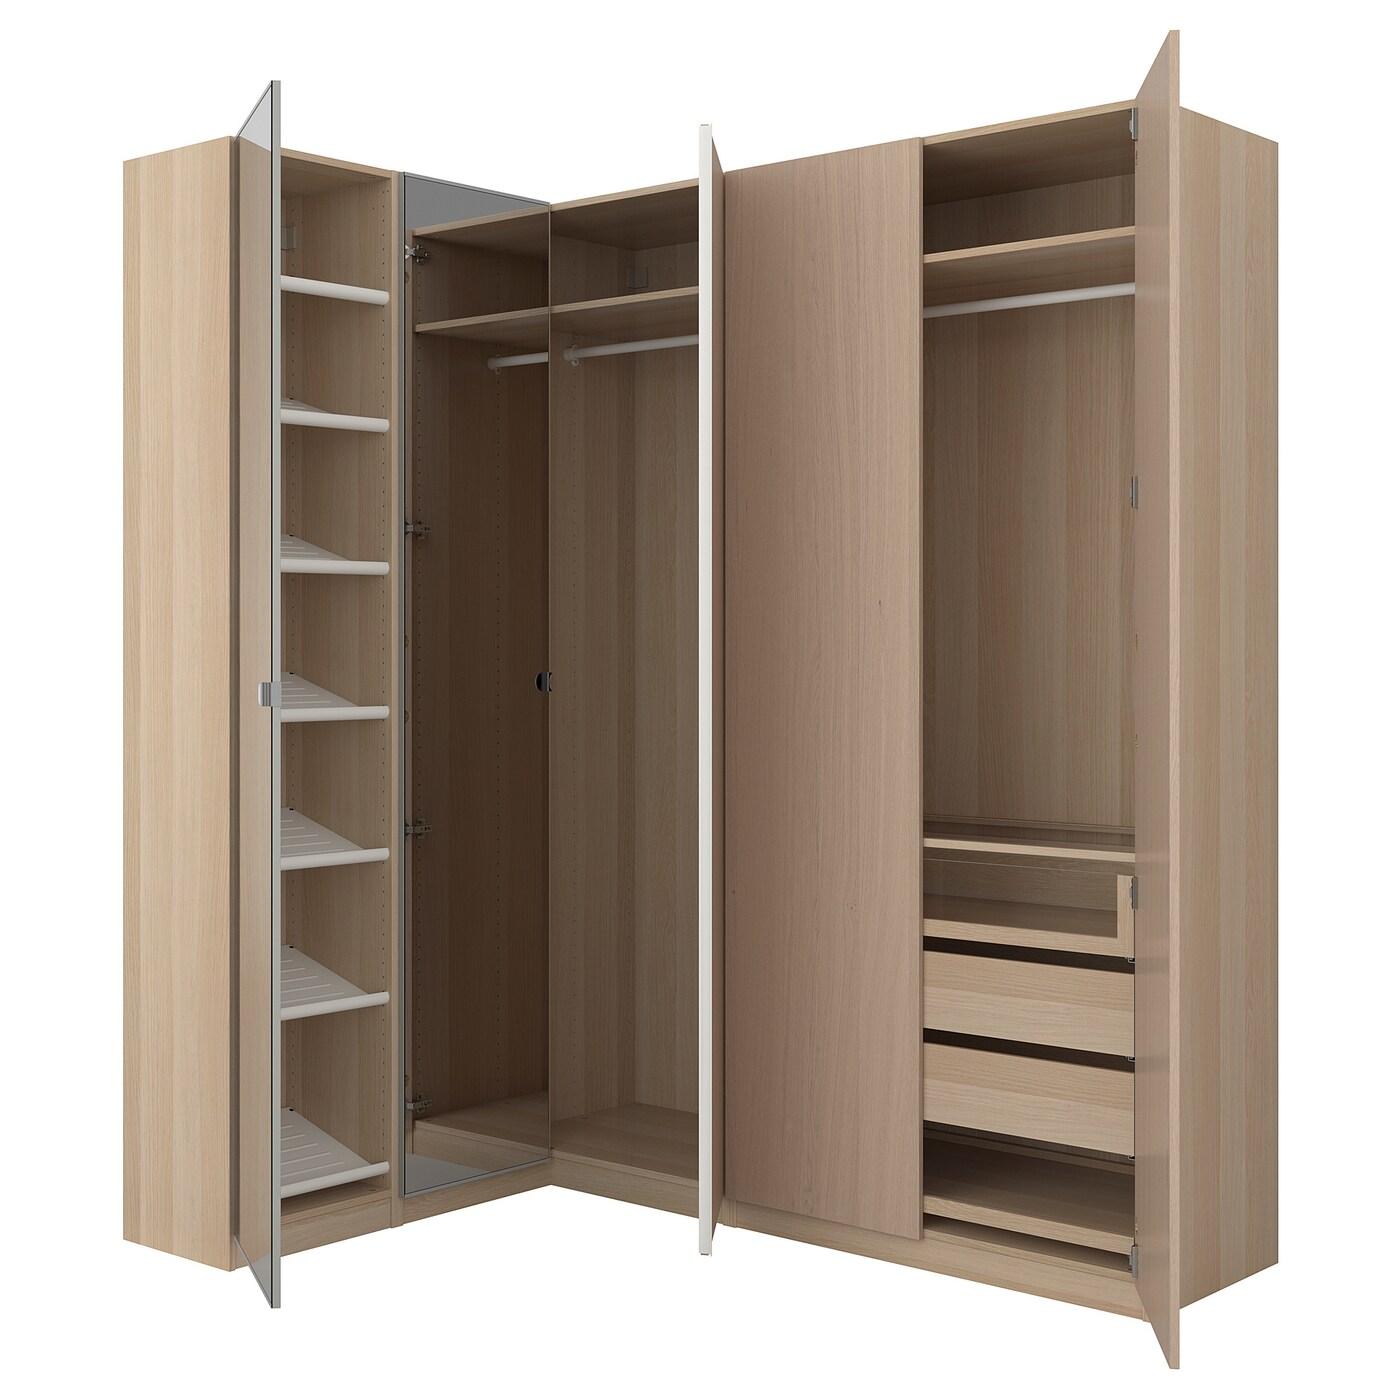 pax corner wardrobe white stained oak effect nexus vikedal 160 188 x 236 cm ikea. Black Bedroom Furniture Sets. Home Design Ideas